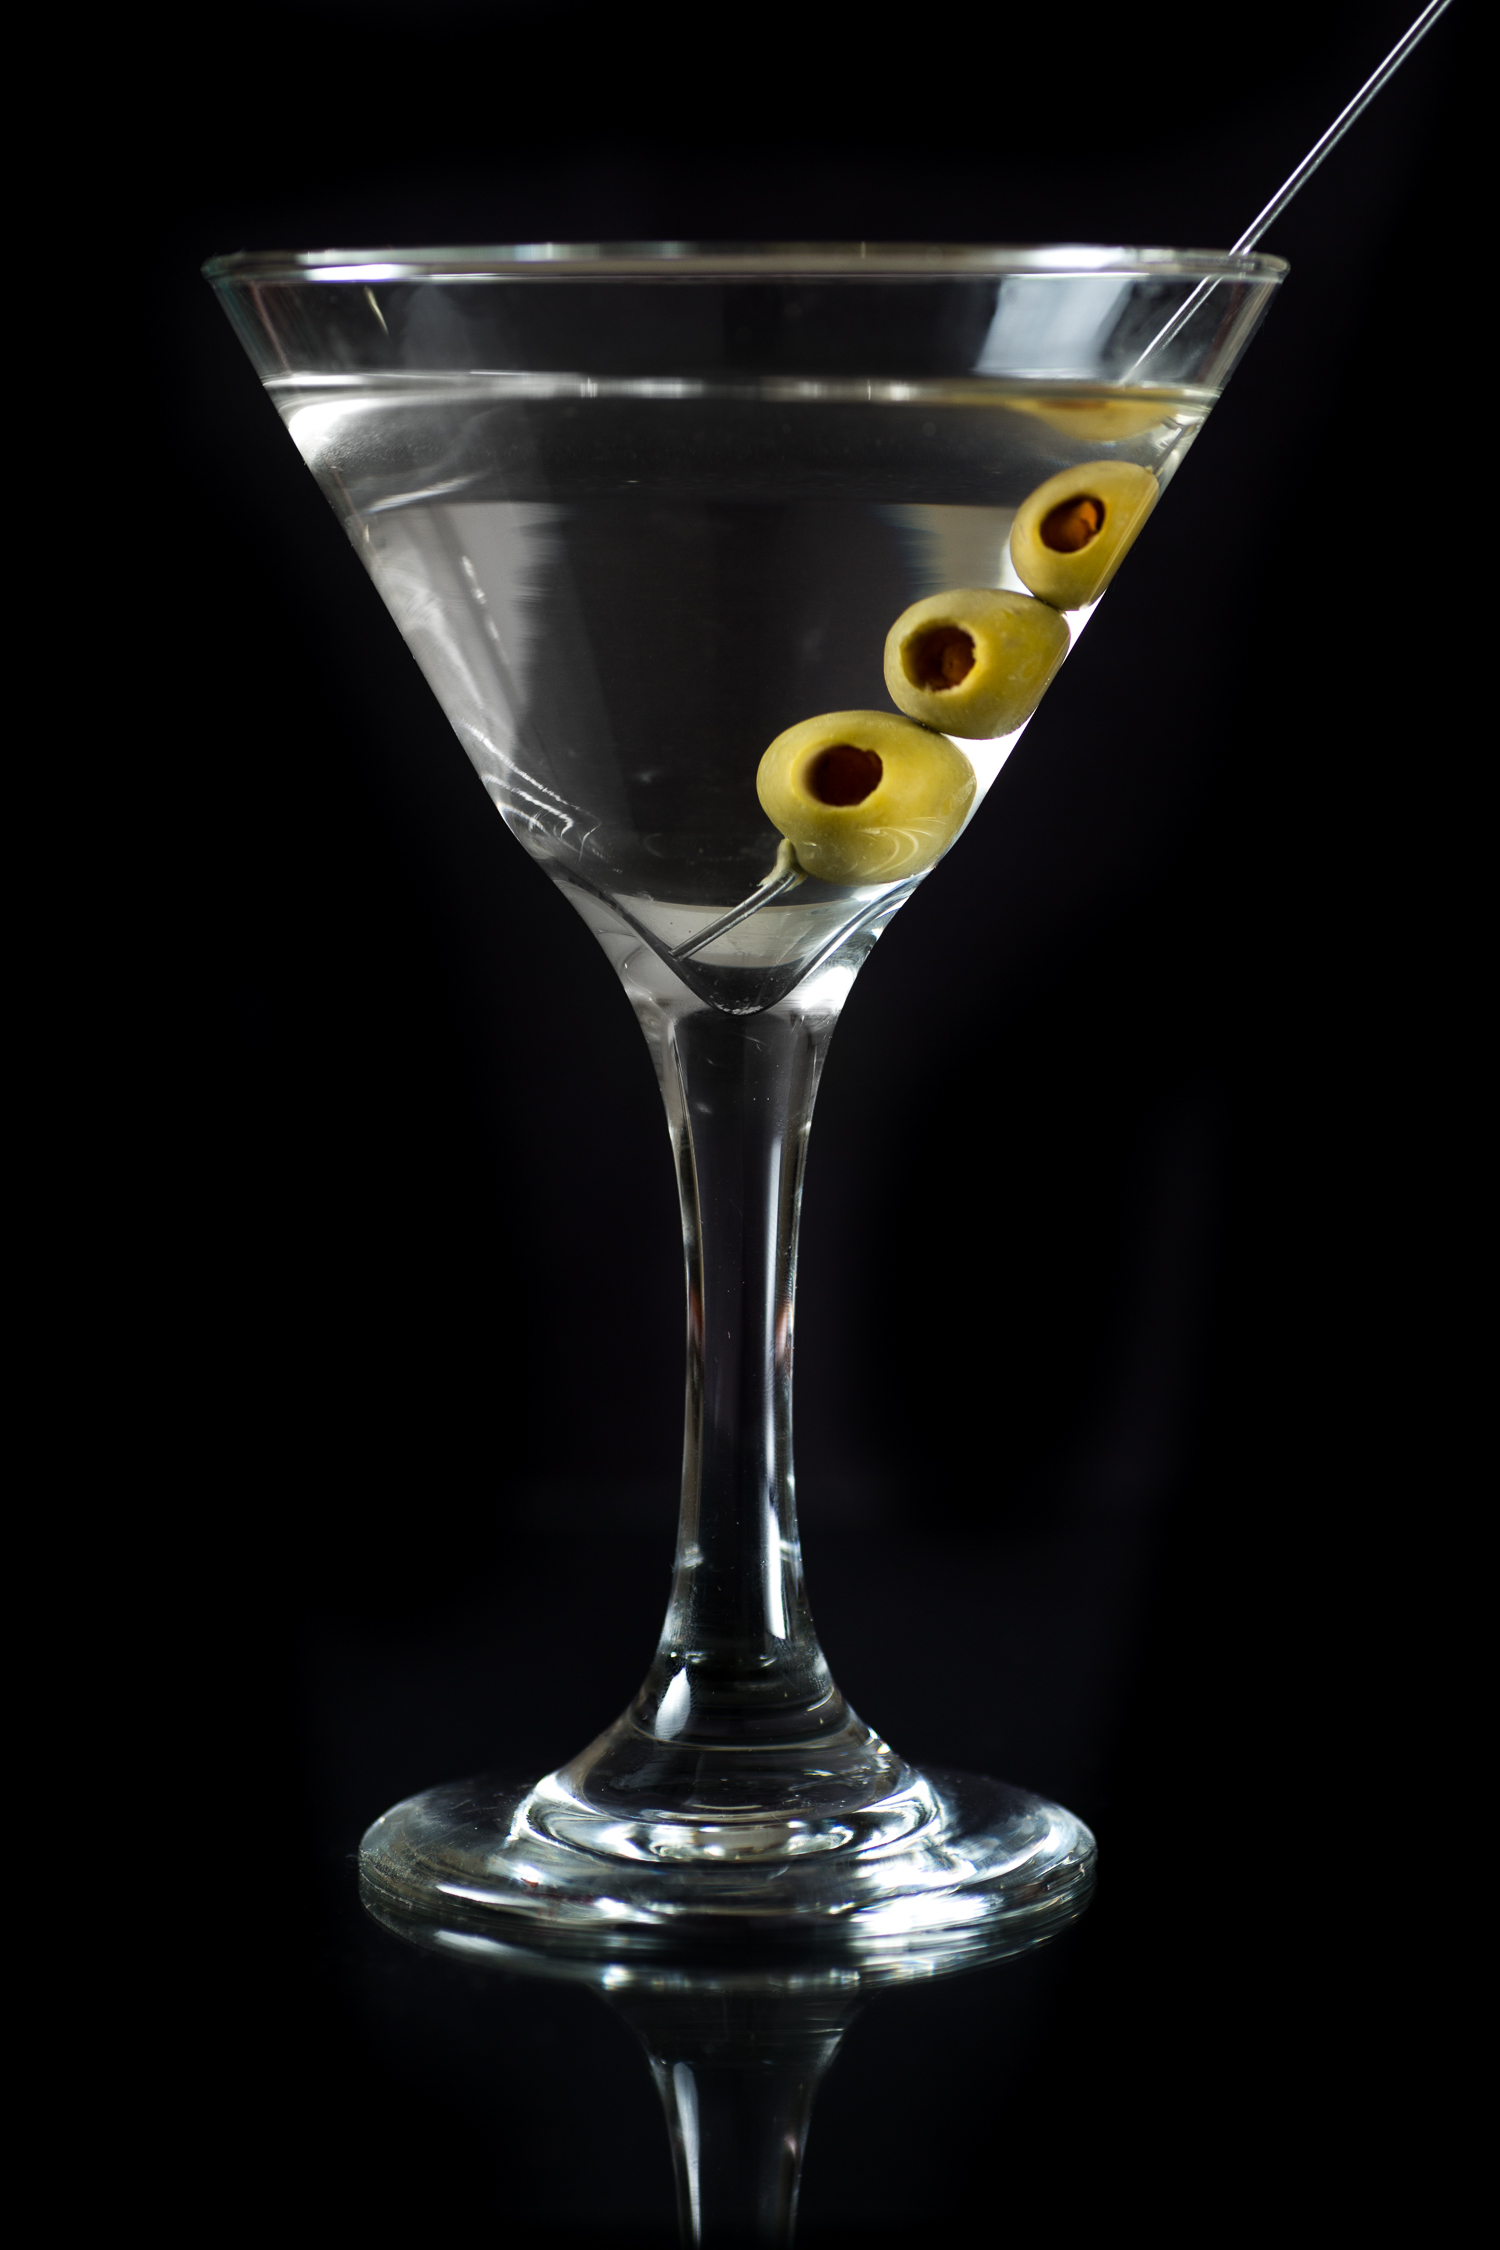 Kansas City Food Photographer - Martini - Cocktails - Restaurant Lifestyle Photography - Studio Food Photographywww.anthem-photo.com-01.jpg